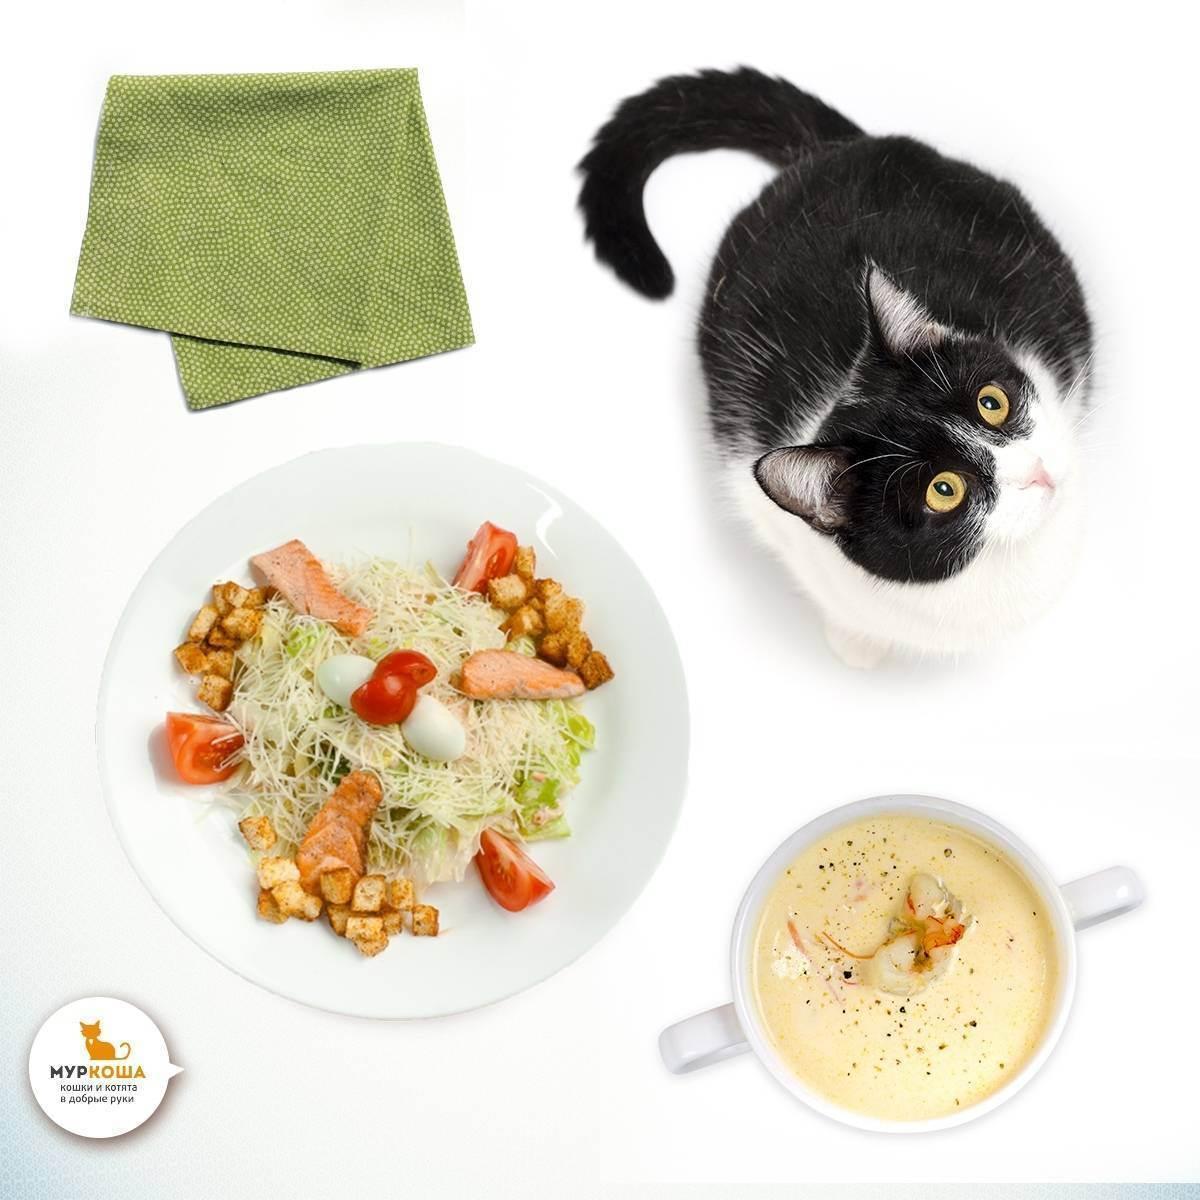 Вреден ли сухой корм для кошек?